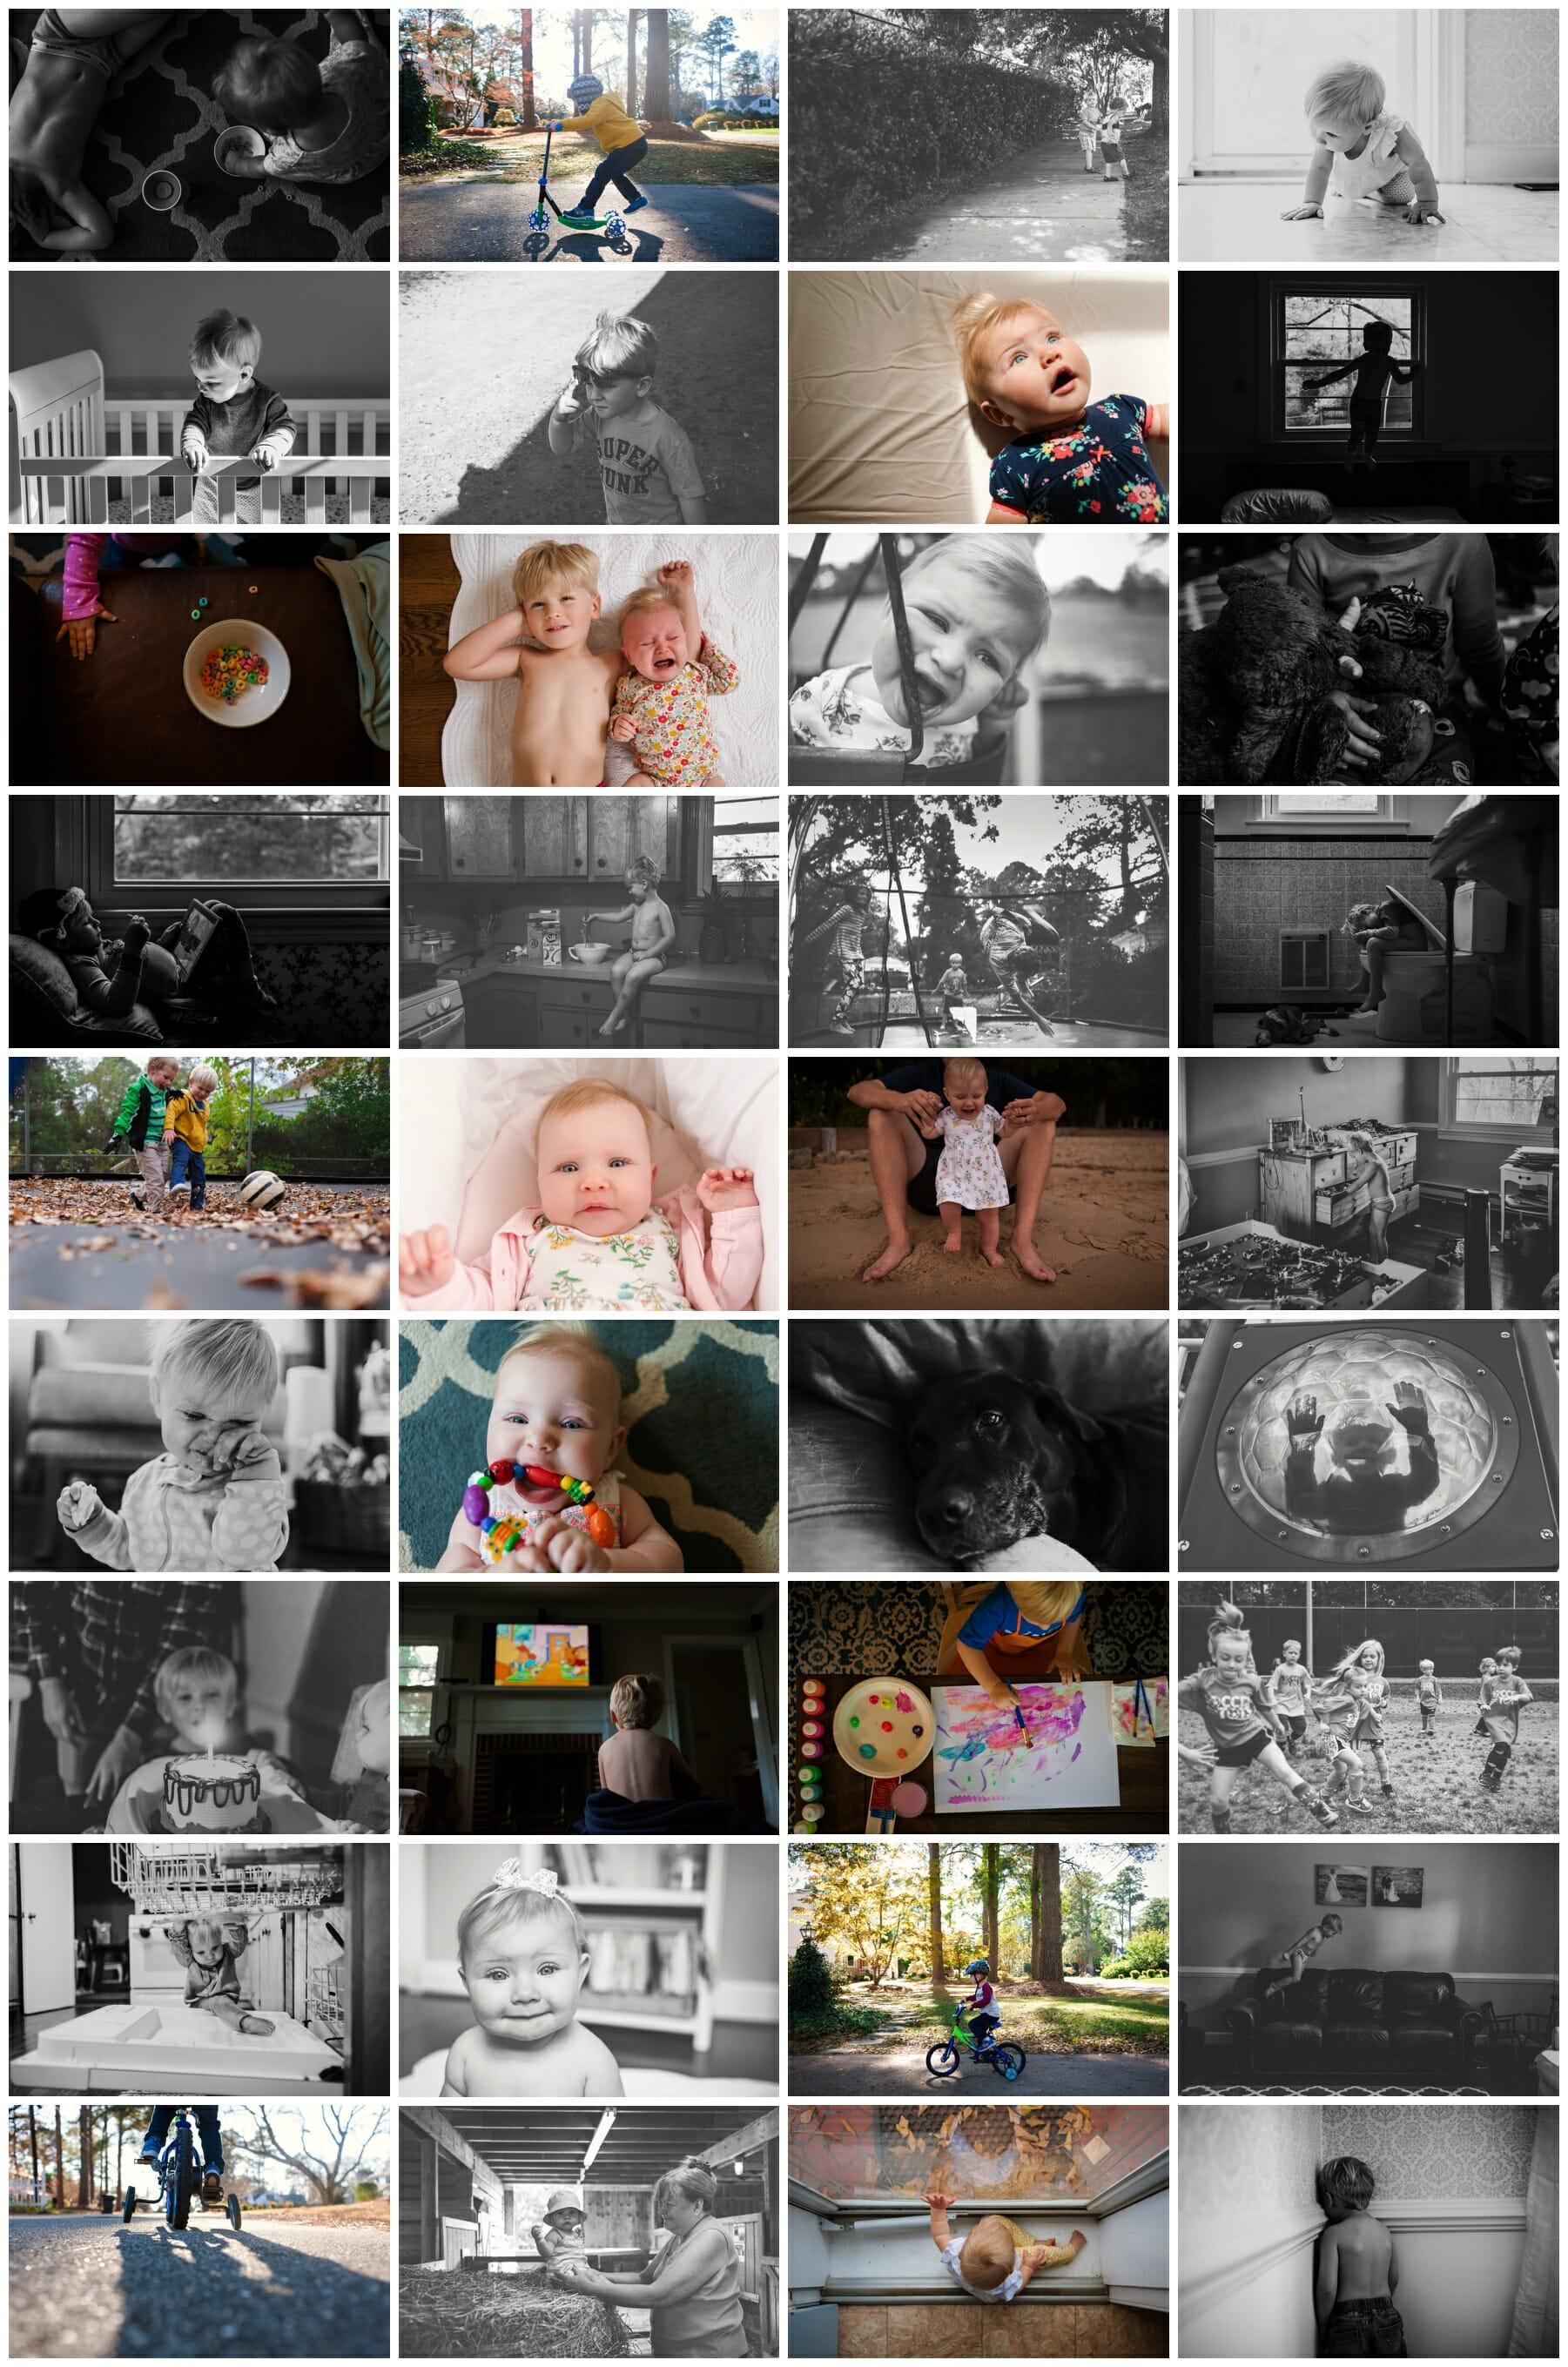 2017 Highlights photo grid